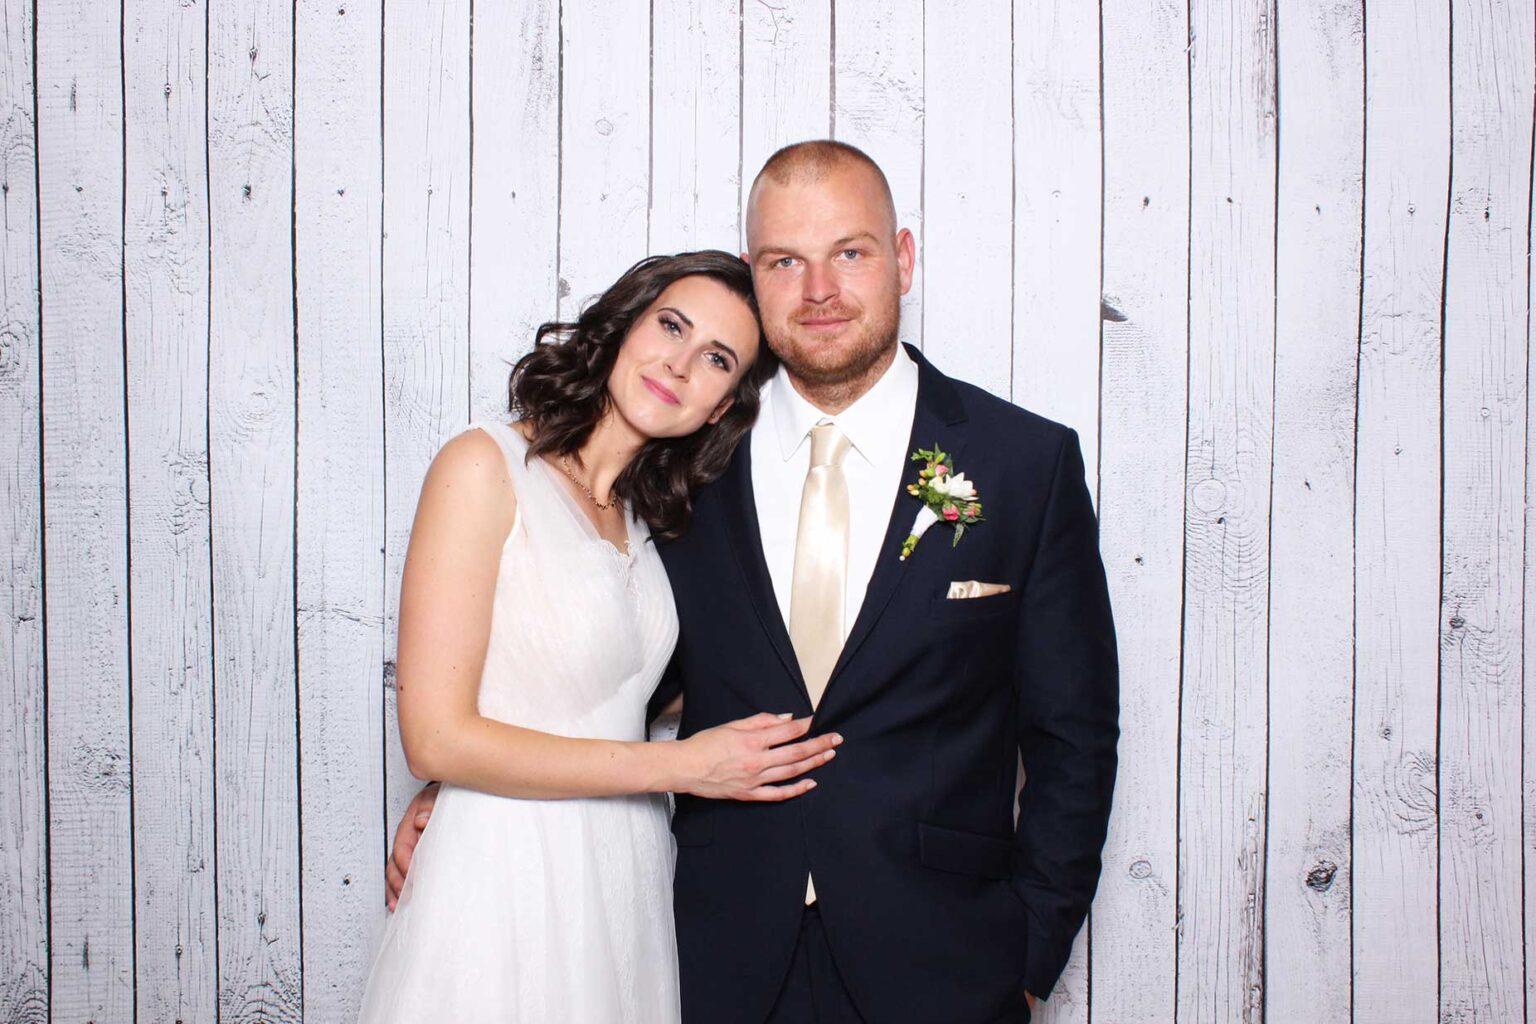 Pozadie White wood - biele drevo, fotokutik svadba.